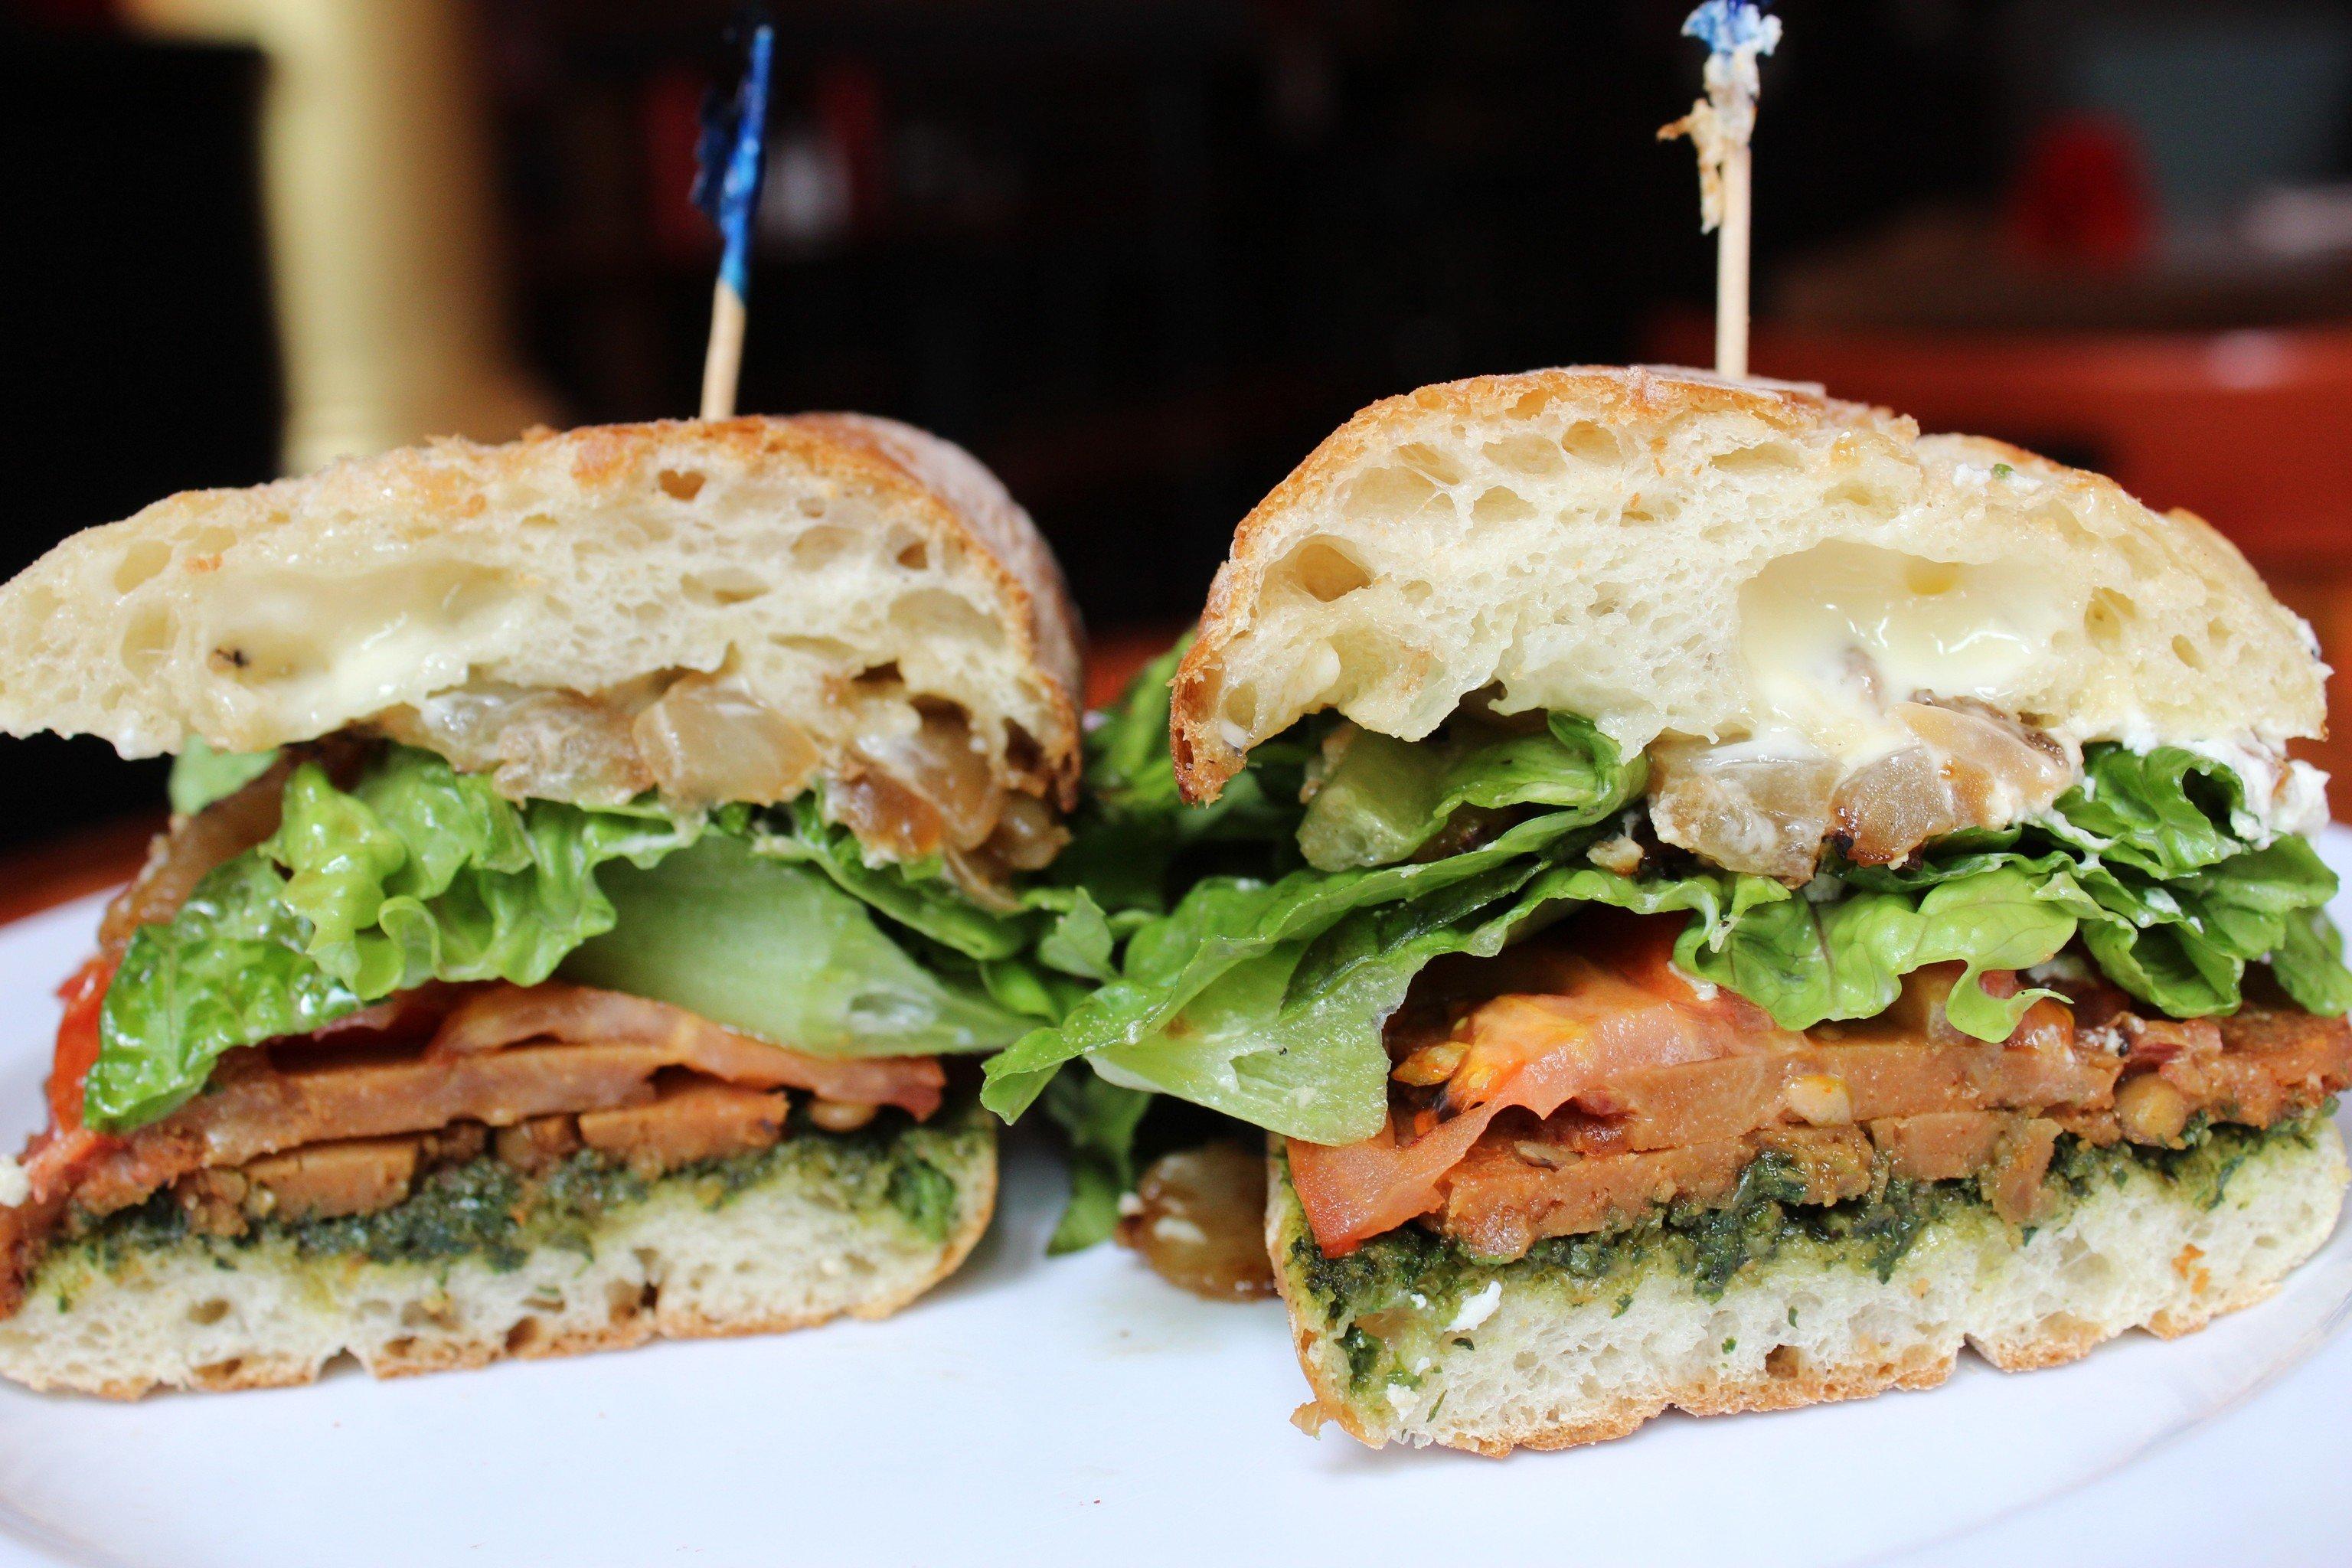 Food + Drink sandwich food plate dish snack food muffuletta half breakfast sandwich veggie burger cut blt white meal produce cuisine ciabatta hamburger meat close